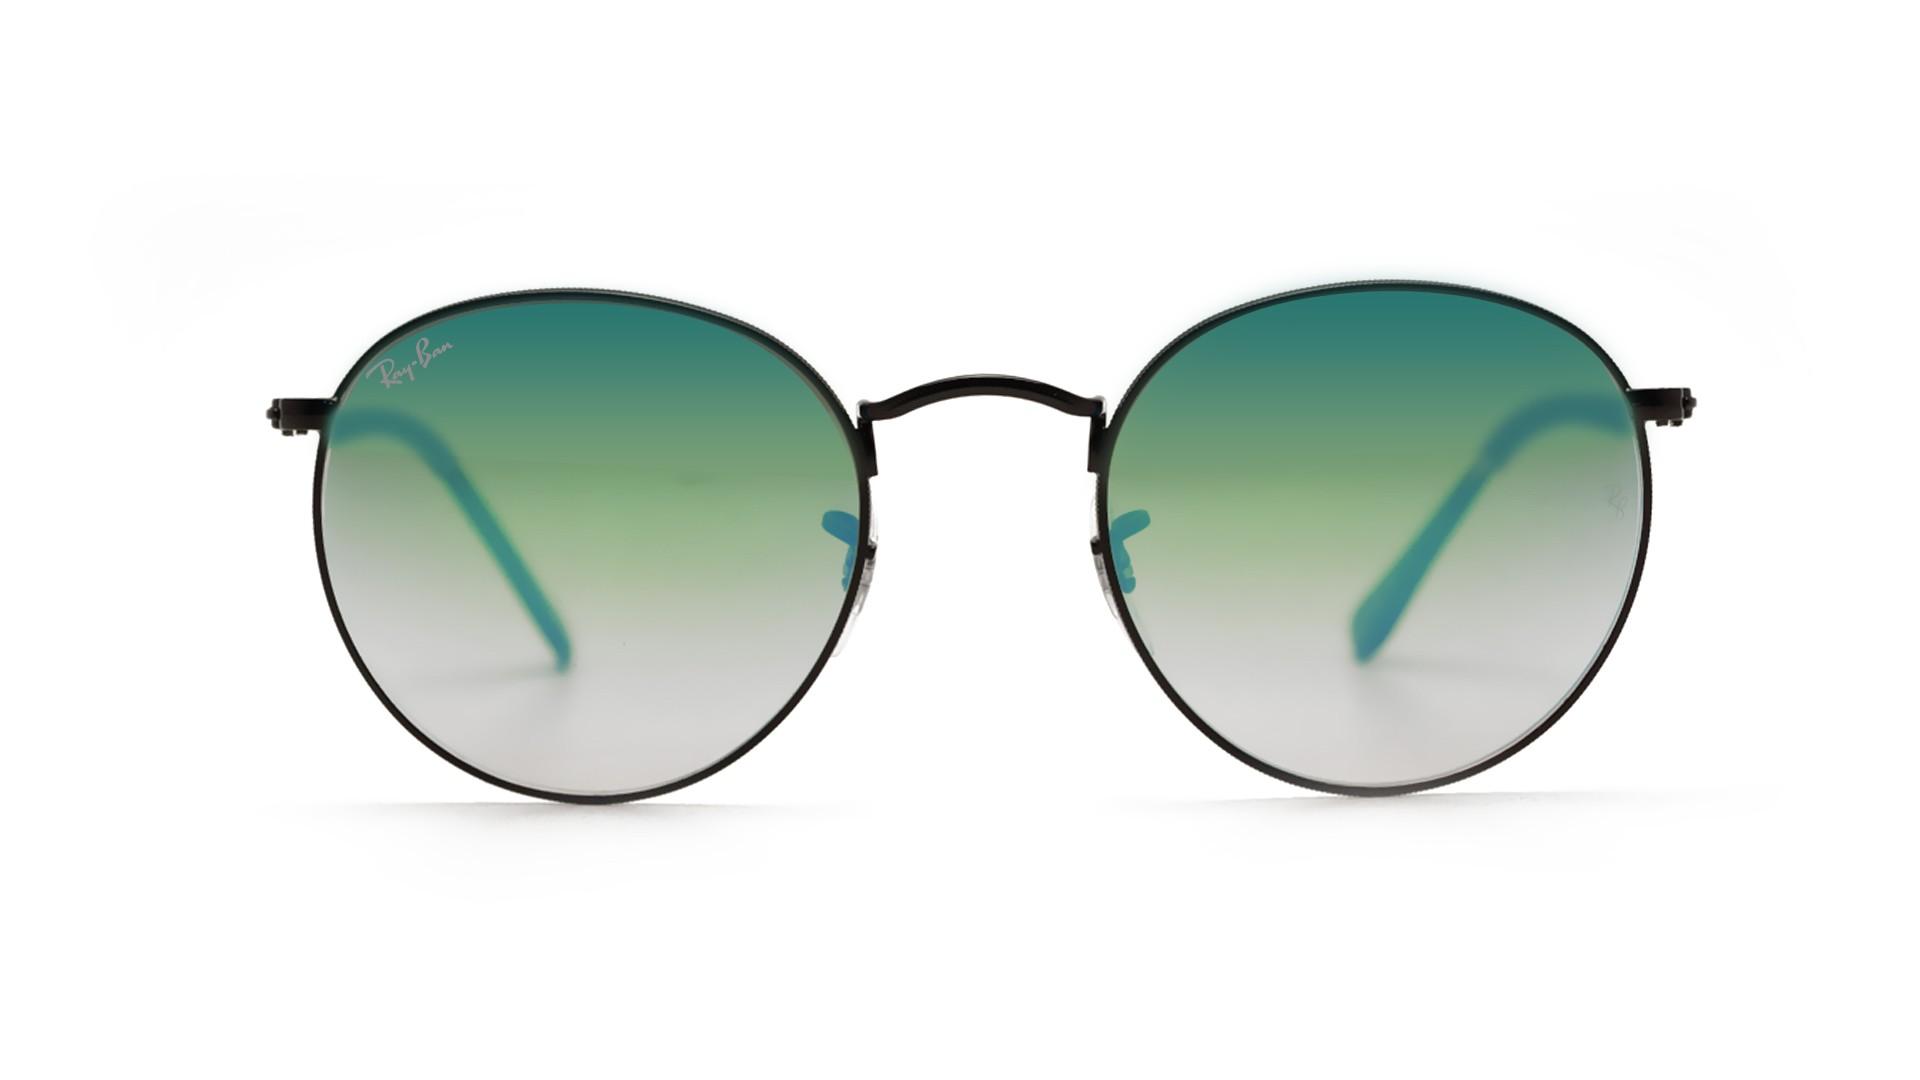 aa6ad0e947be7 Sunglasses Ray-Ban Round Metal Black RB3447 002 4J 50-21 Medium Gradient  Mirror